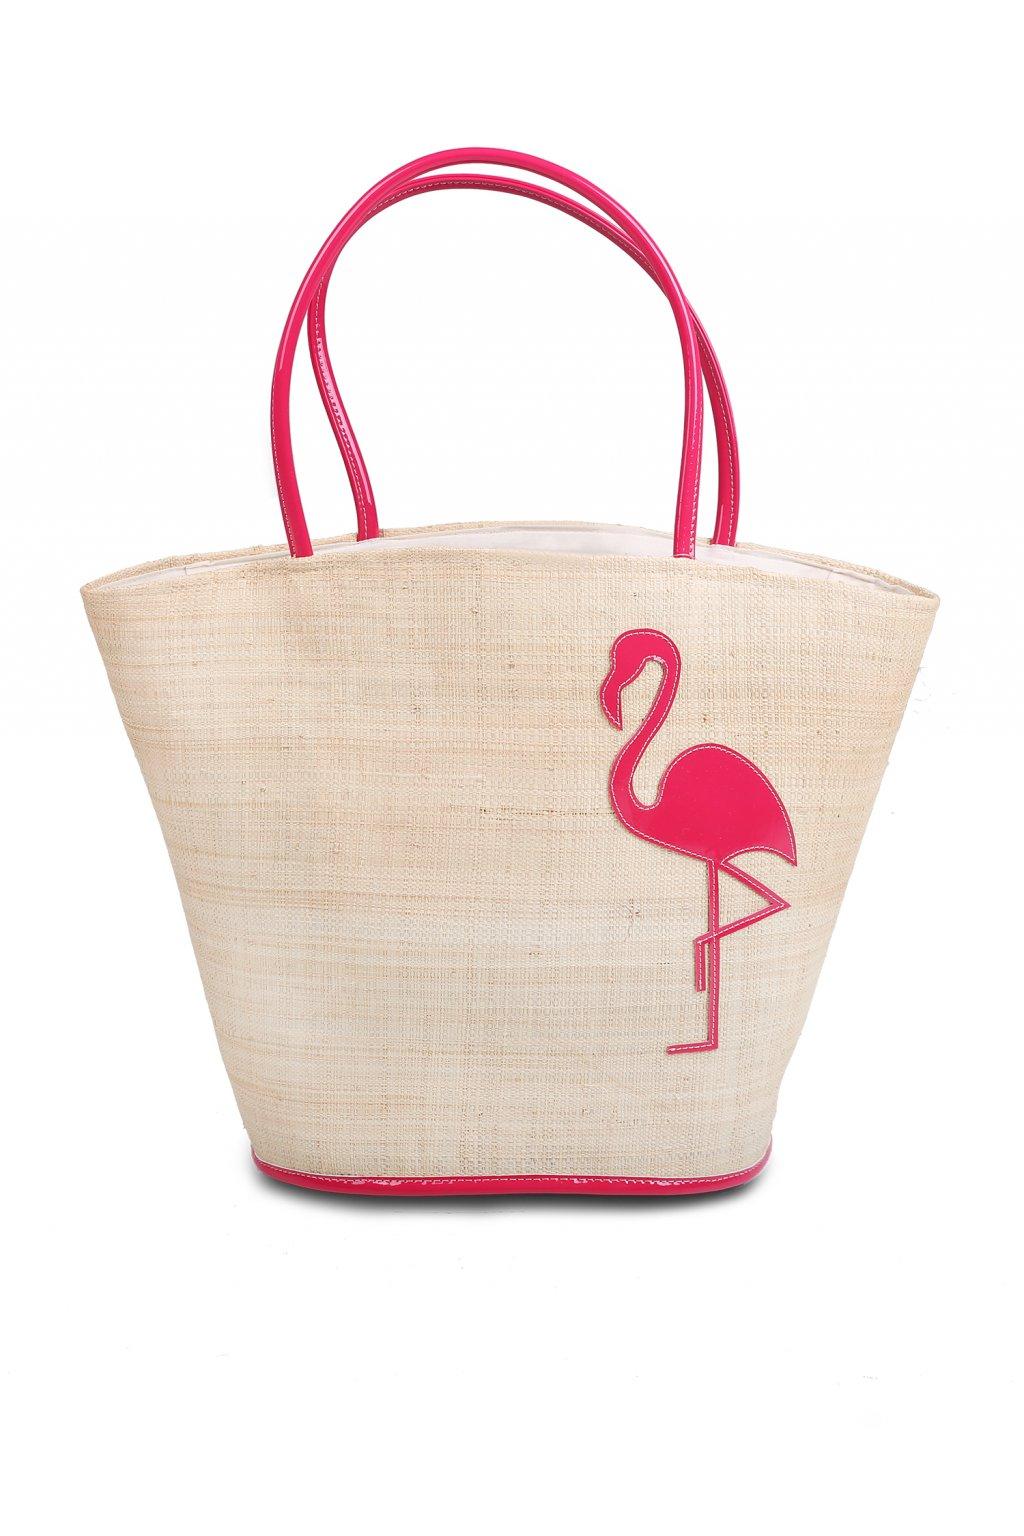 POUPEE plážový koš - taška FLAMINGO